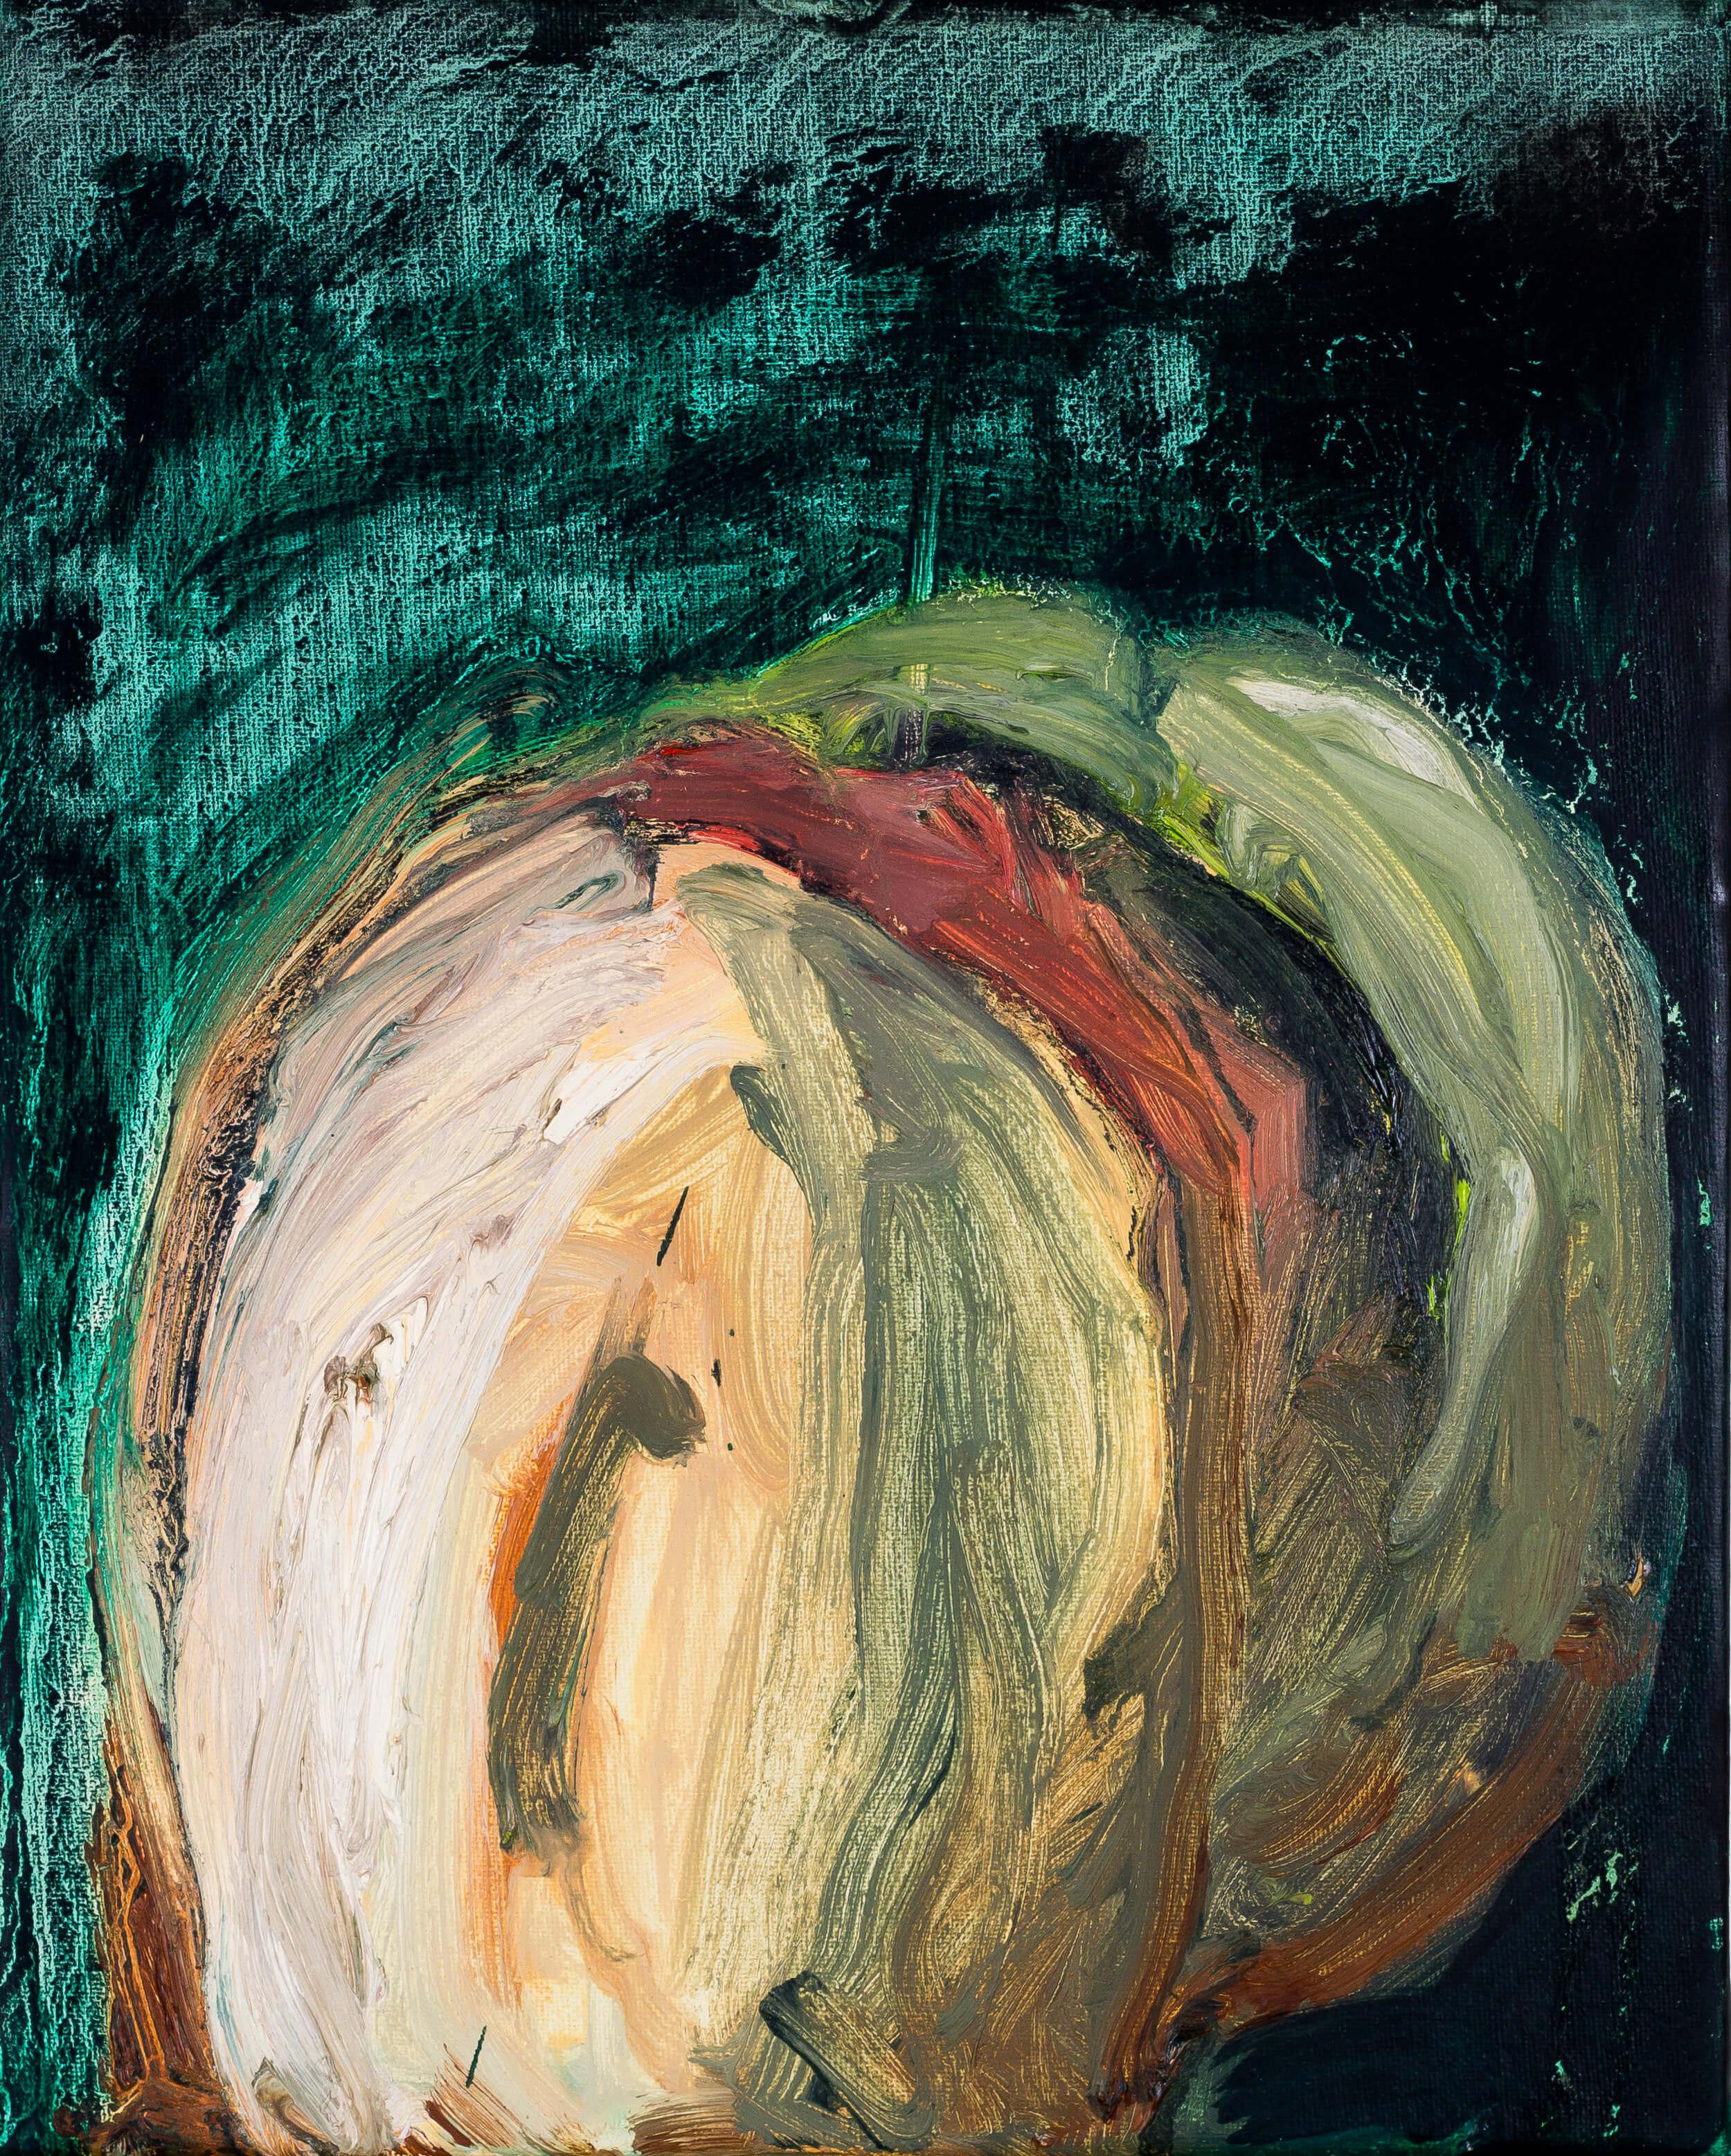 Katharina Albers, Transformation XXV, 2011, Öl auf Leinwand, 30×24 cm